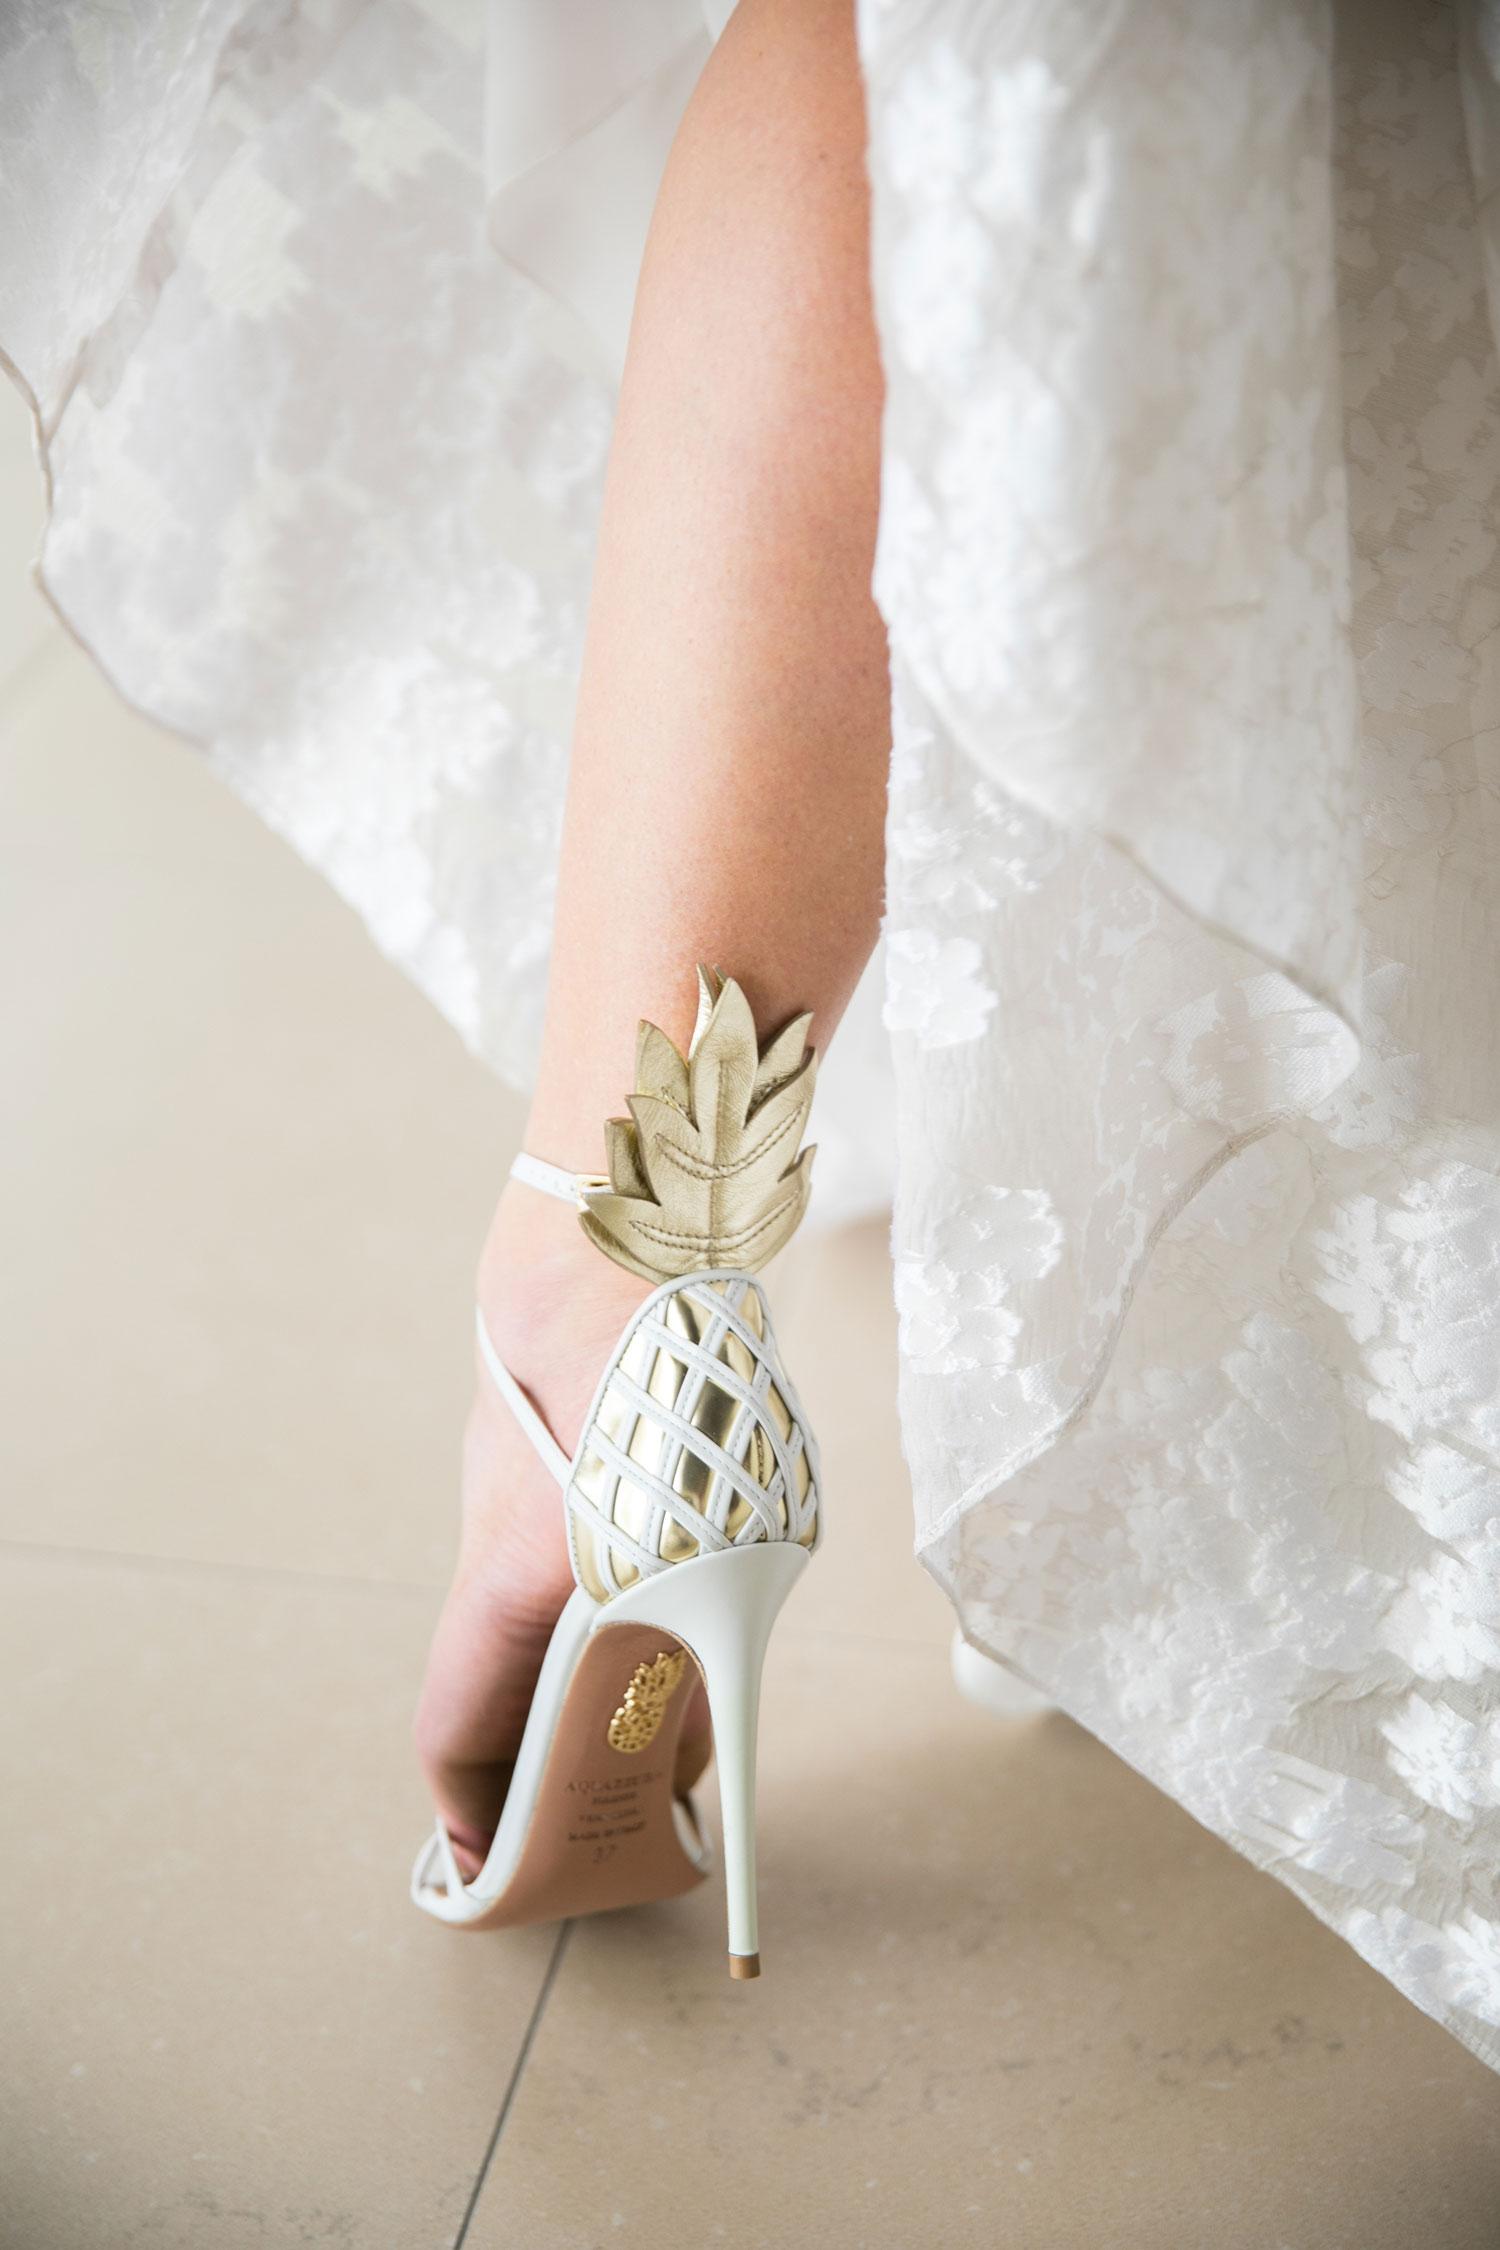 Palm tree pineapple design wedding shoes that aren't boring